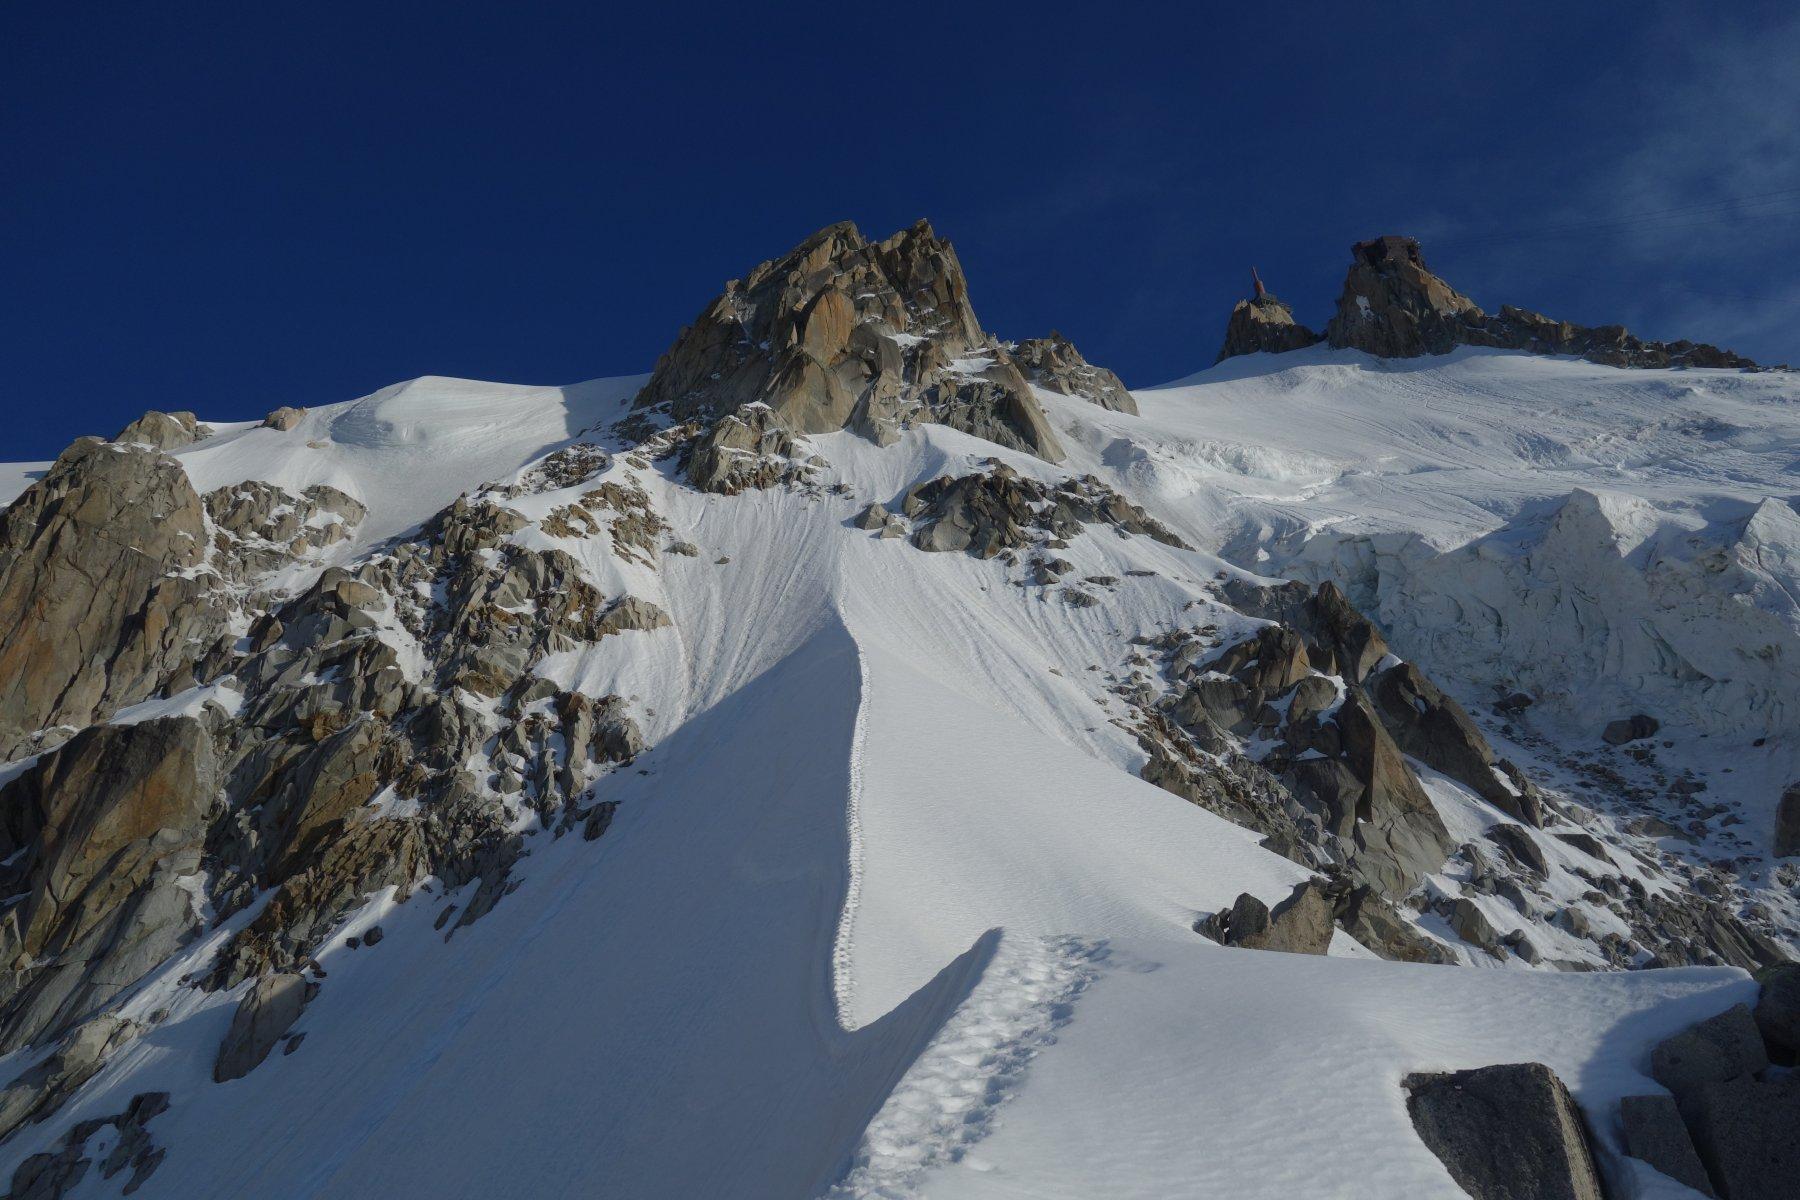 La cresta nevosa